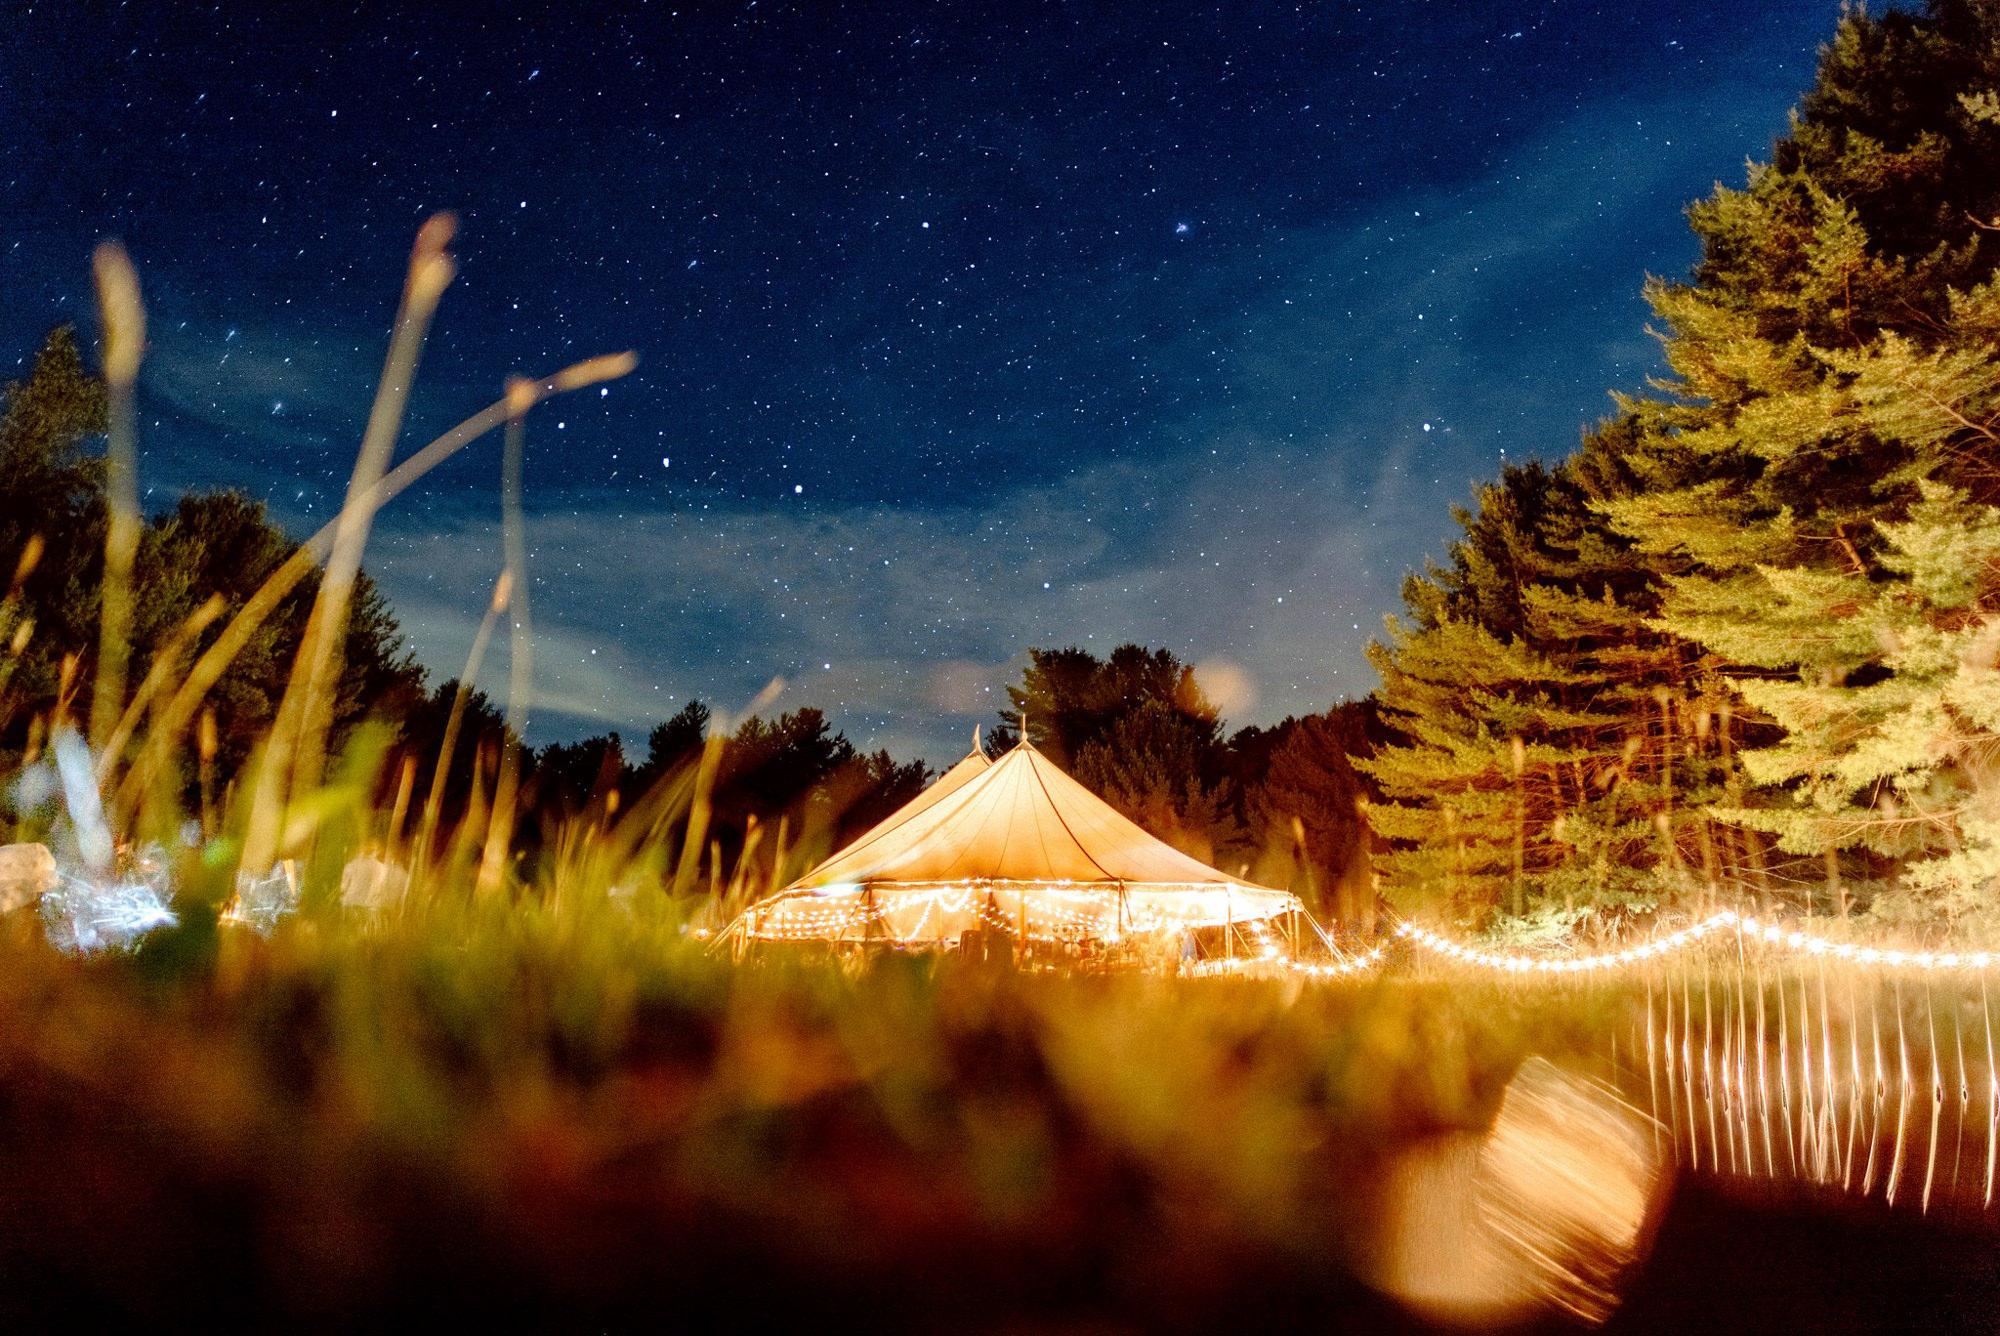 rustic-tent-ceremony-at-night-through-trees-worlds-best-wedding-photos-benj-haisch-seattle-wedding-photographers